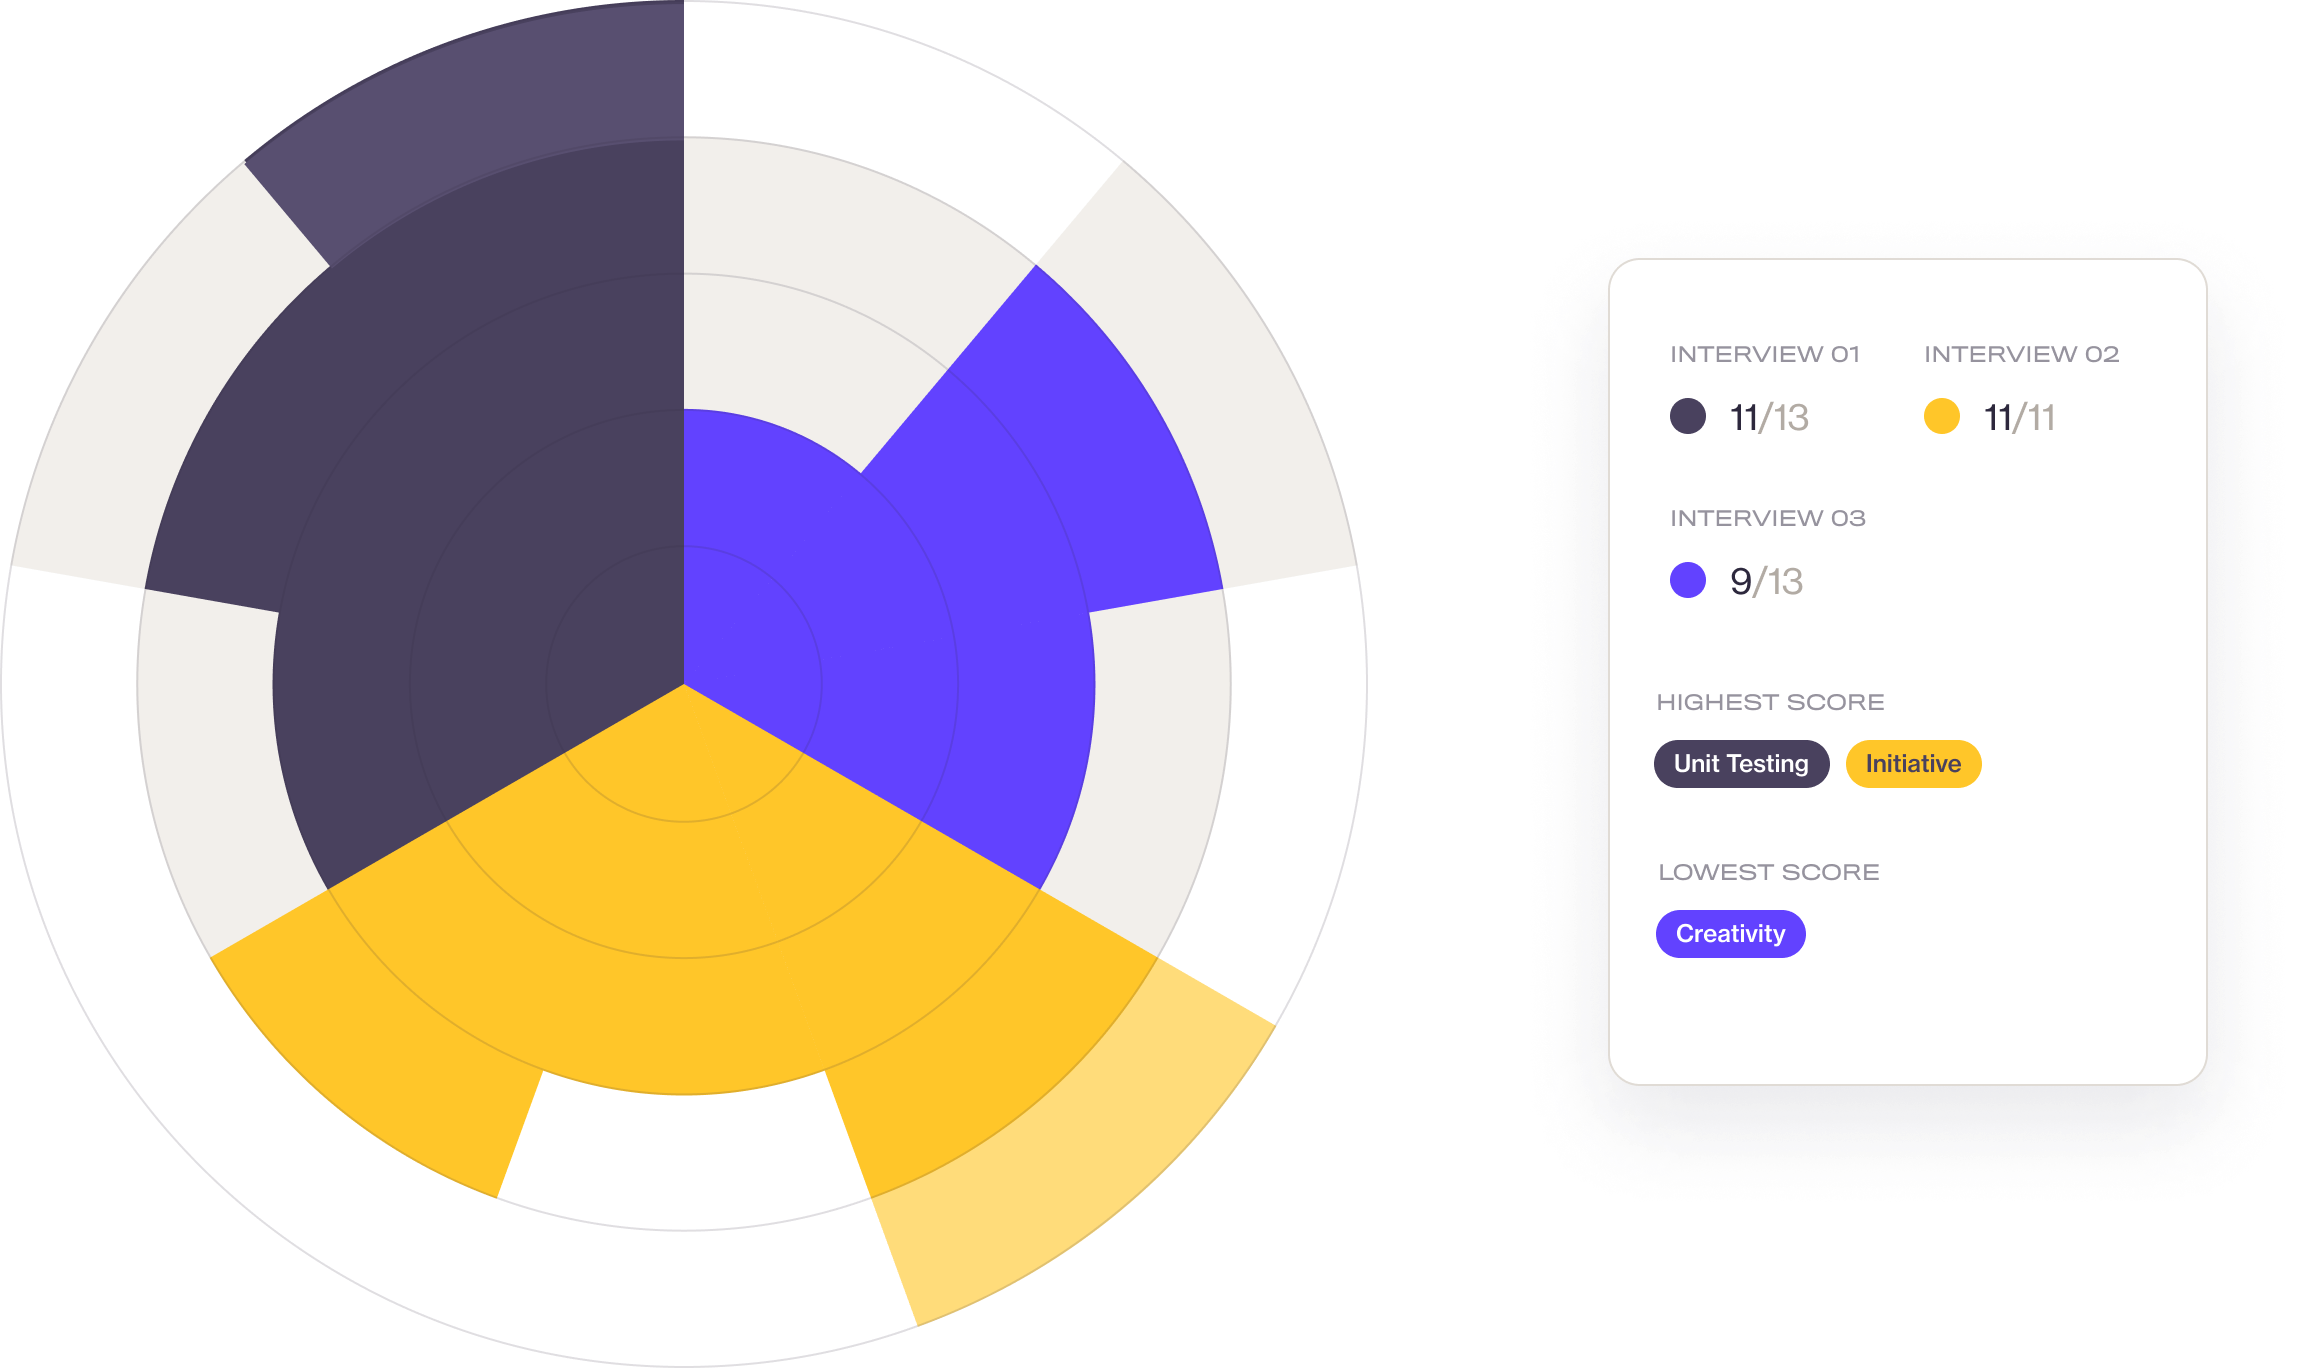 Scorecard data visualization UI mockup